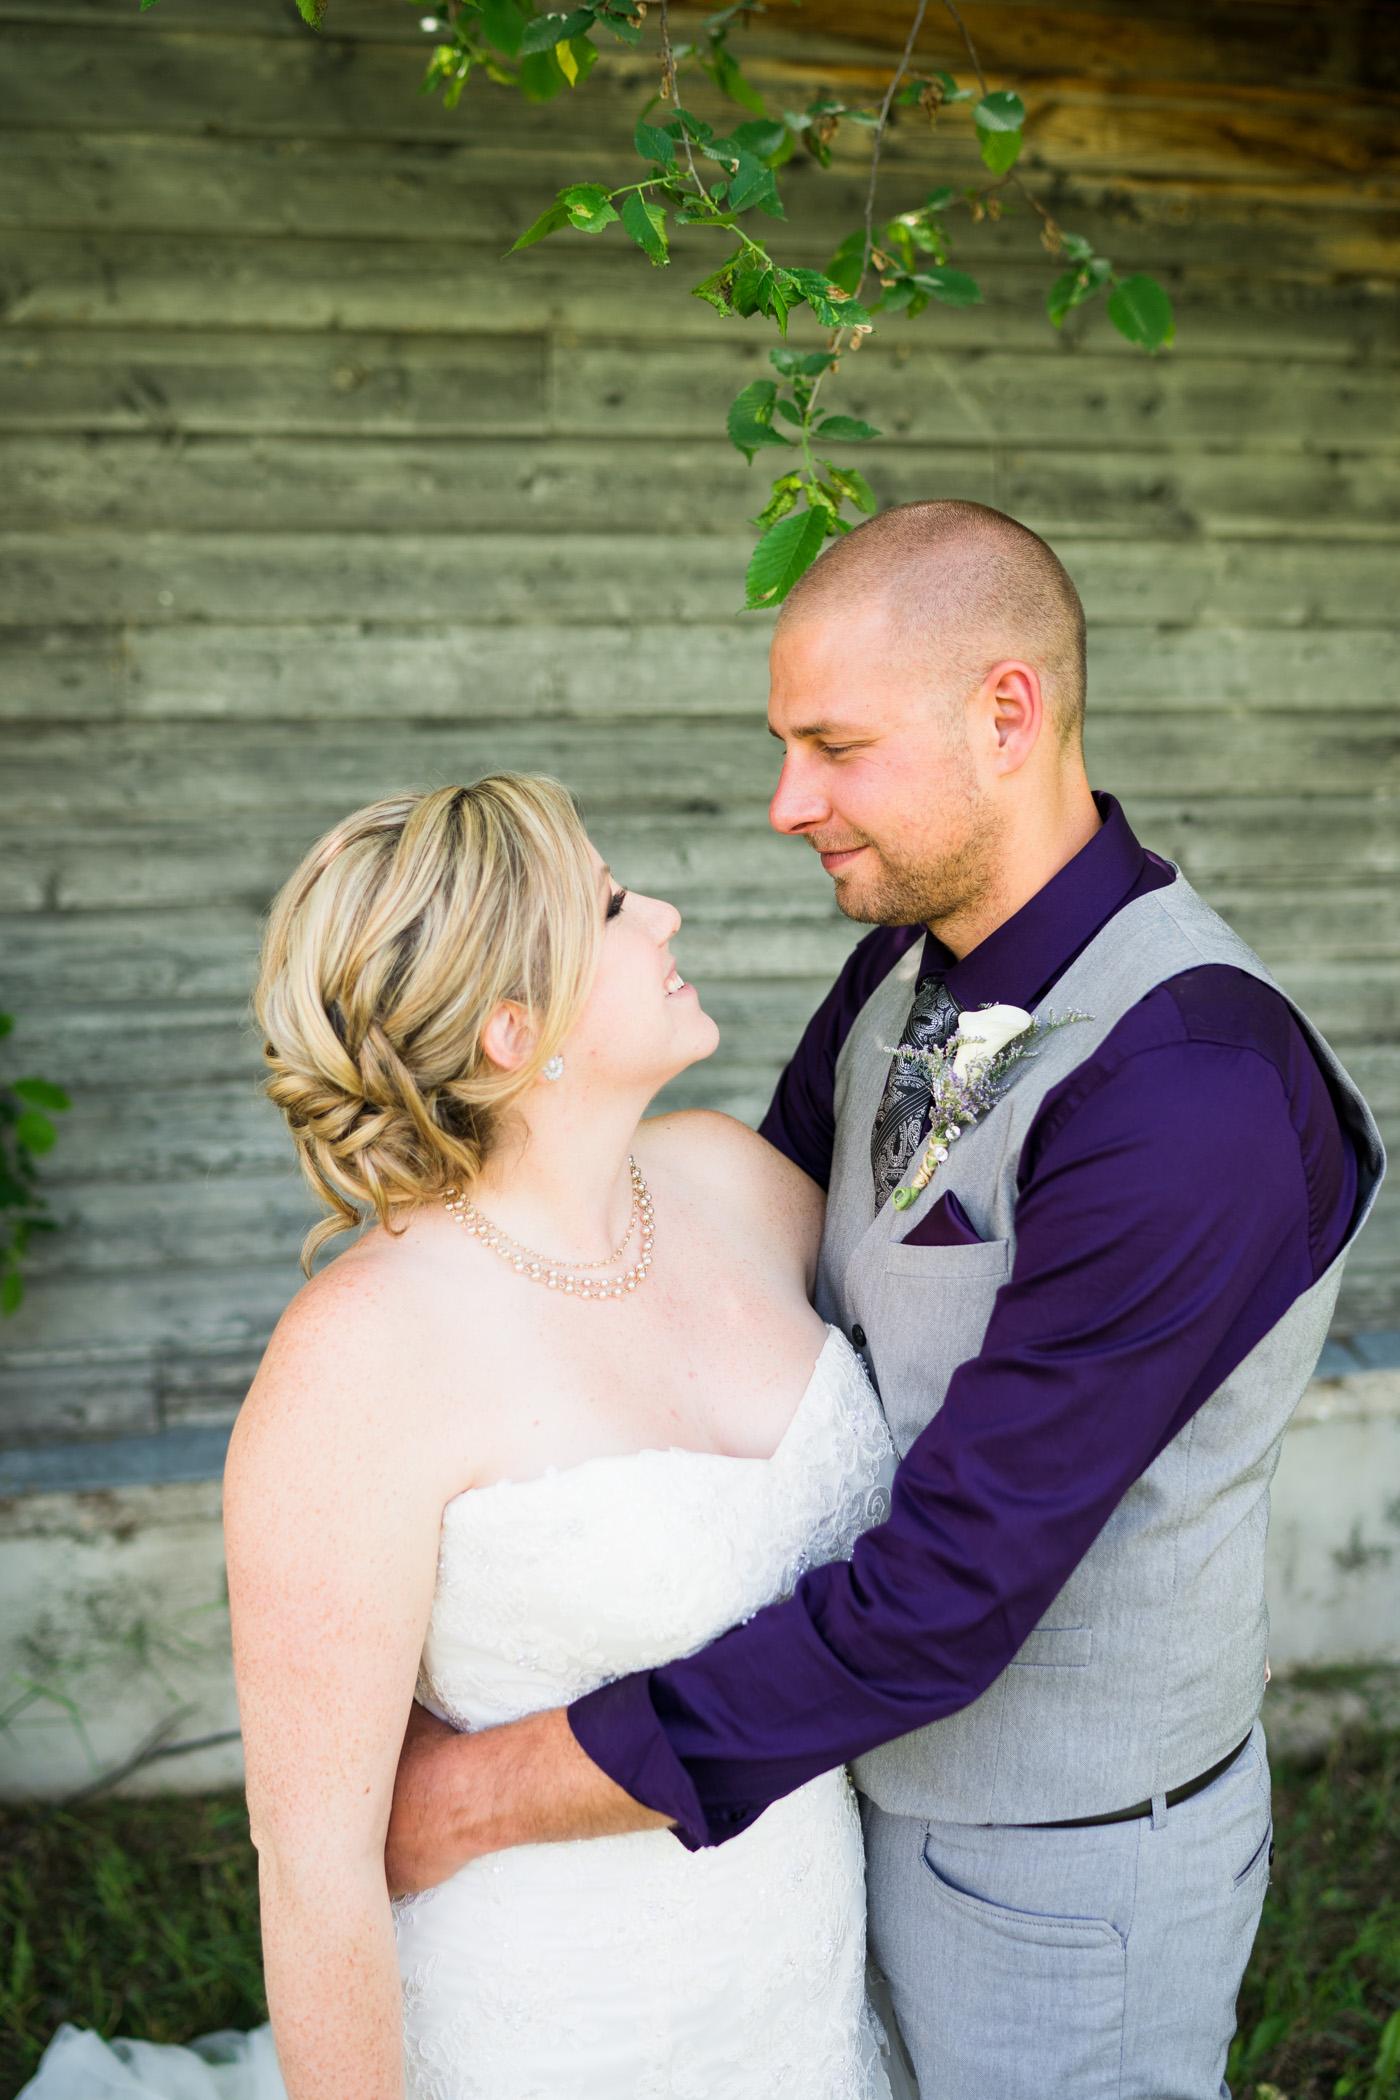 COJO Photo - Whitney and Steve - Wedding-868.jpg